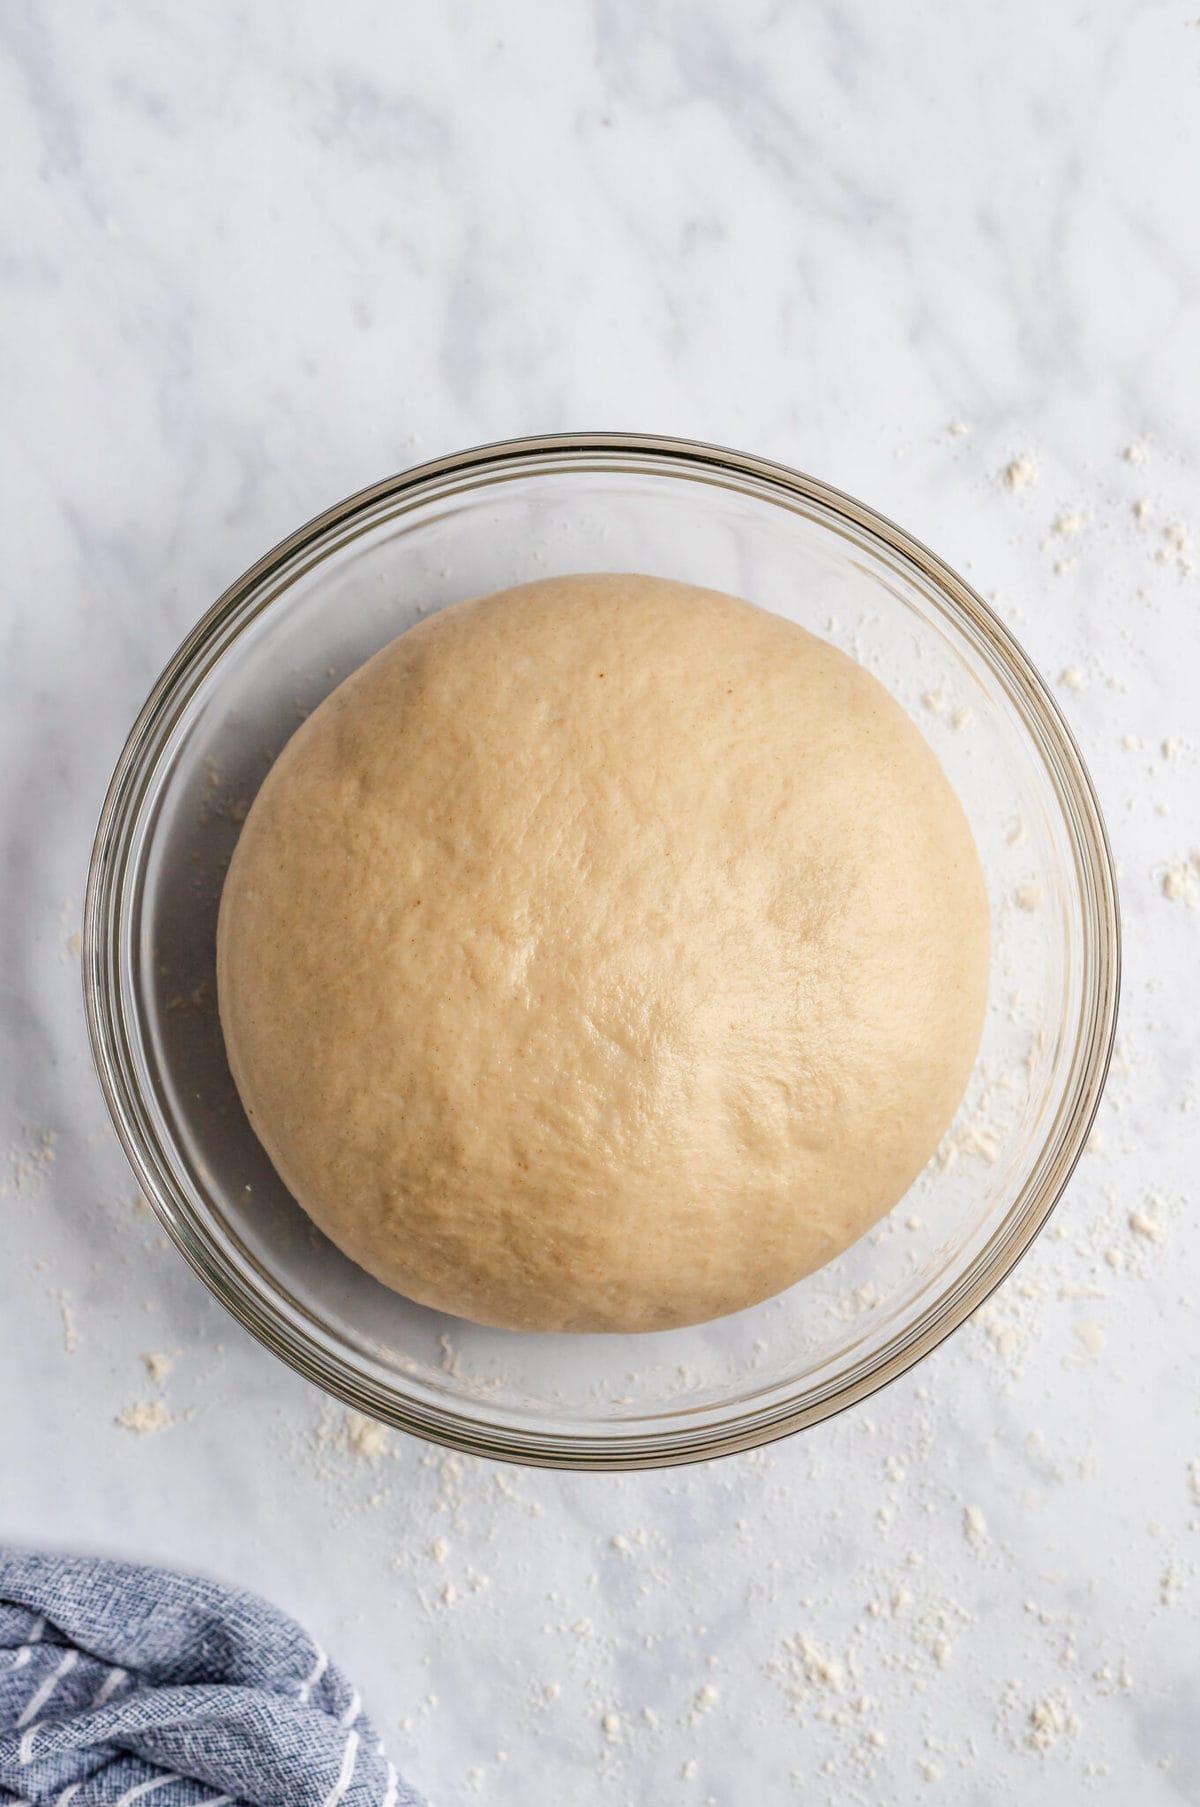 risen dough in a bowl